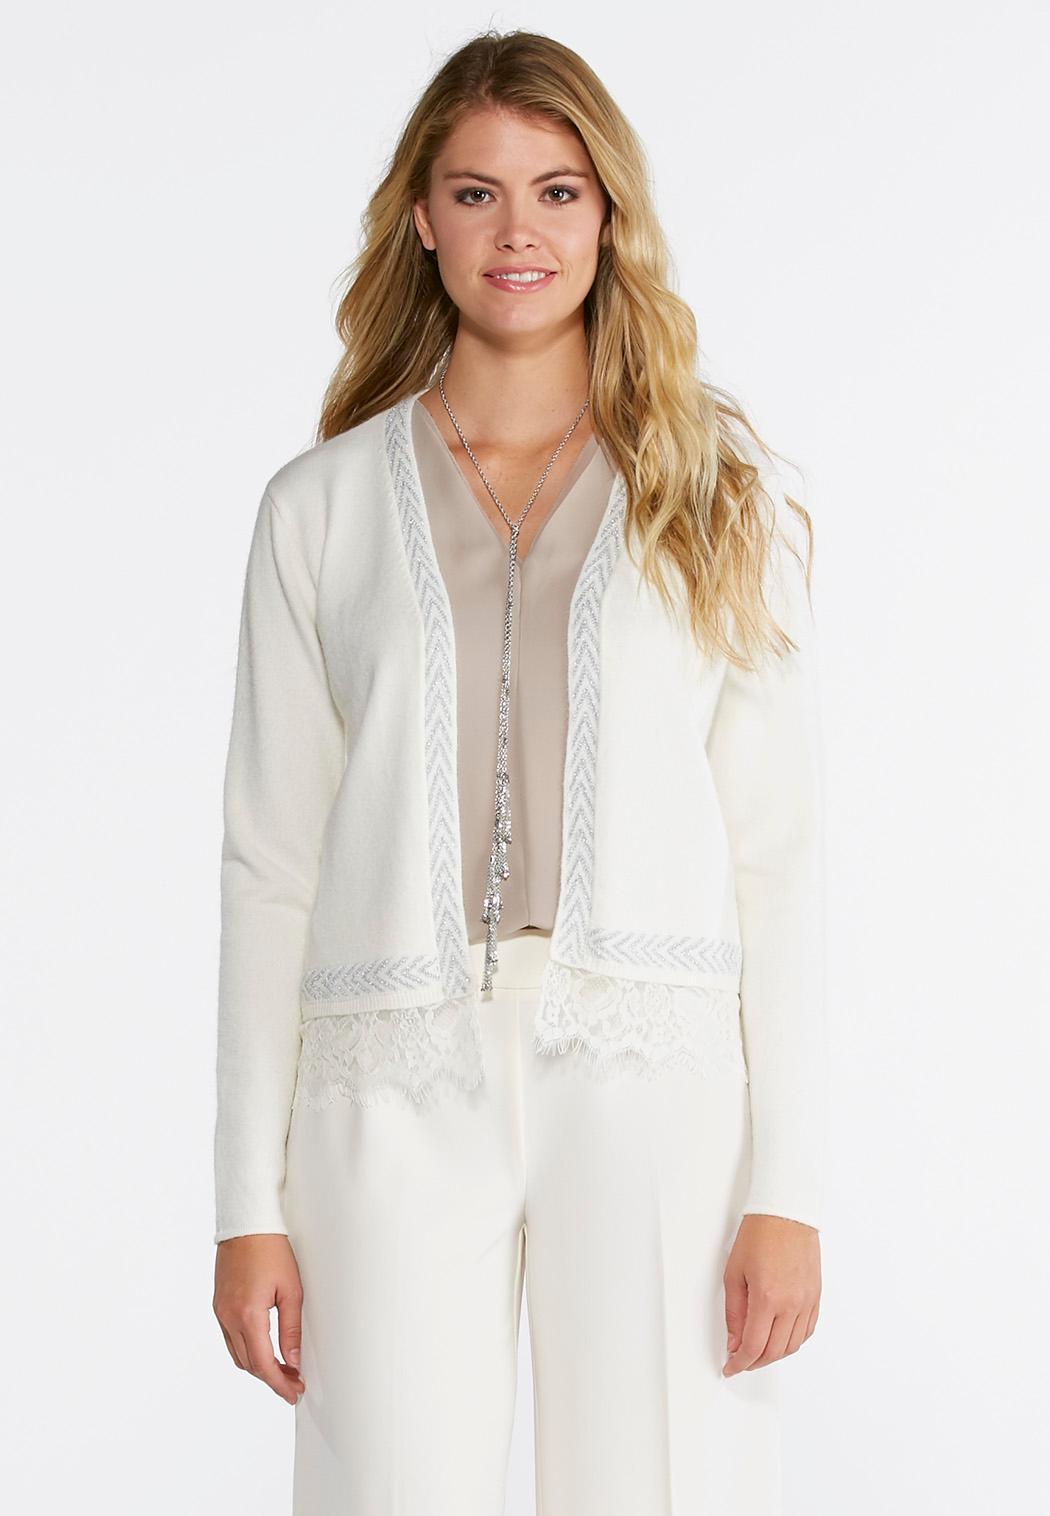 Lace Trim Cardigan Cardigans & Shrugs Cato Fashions